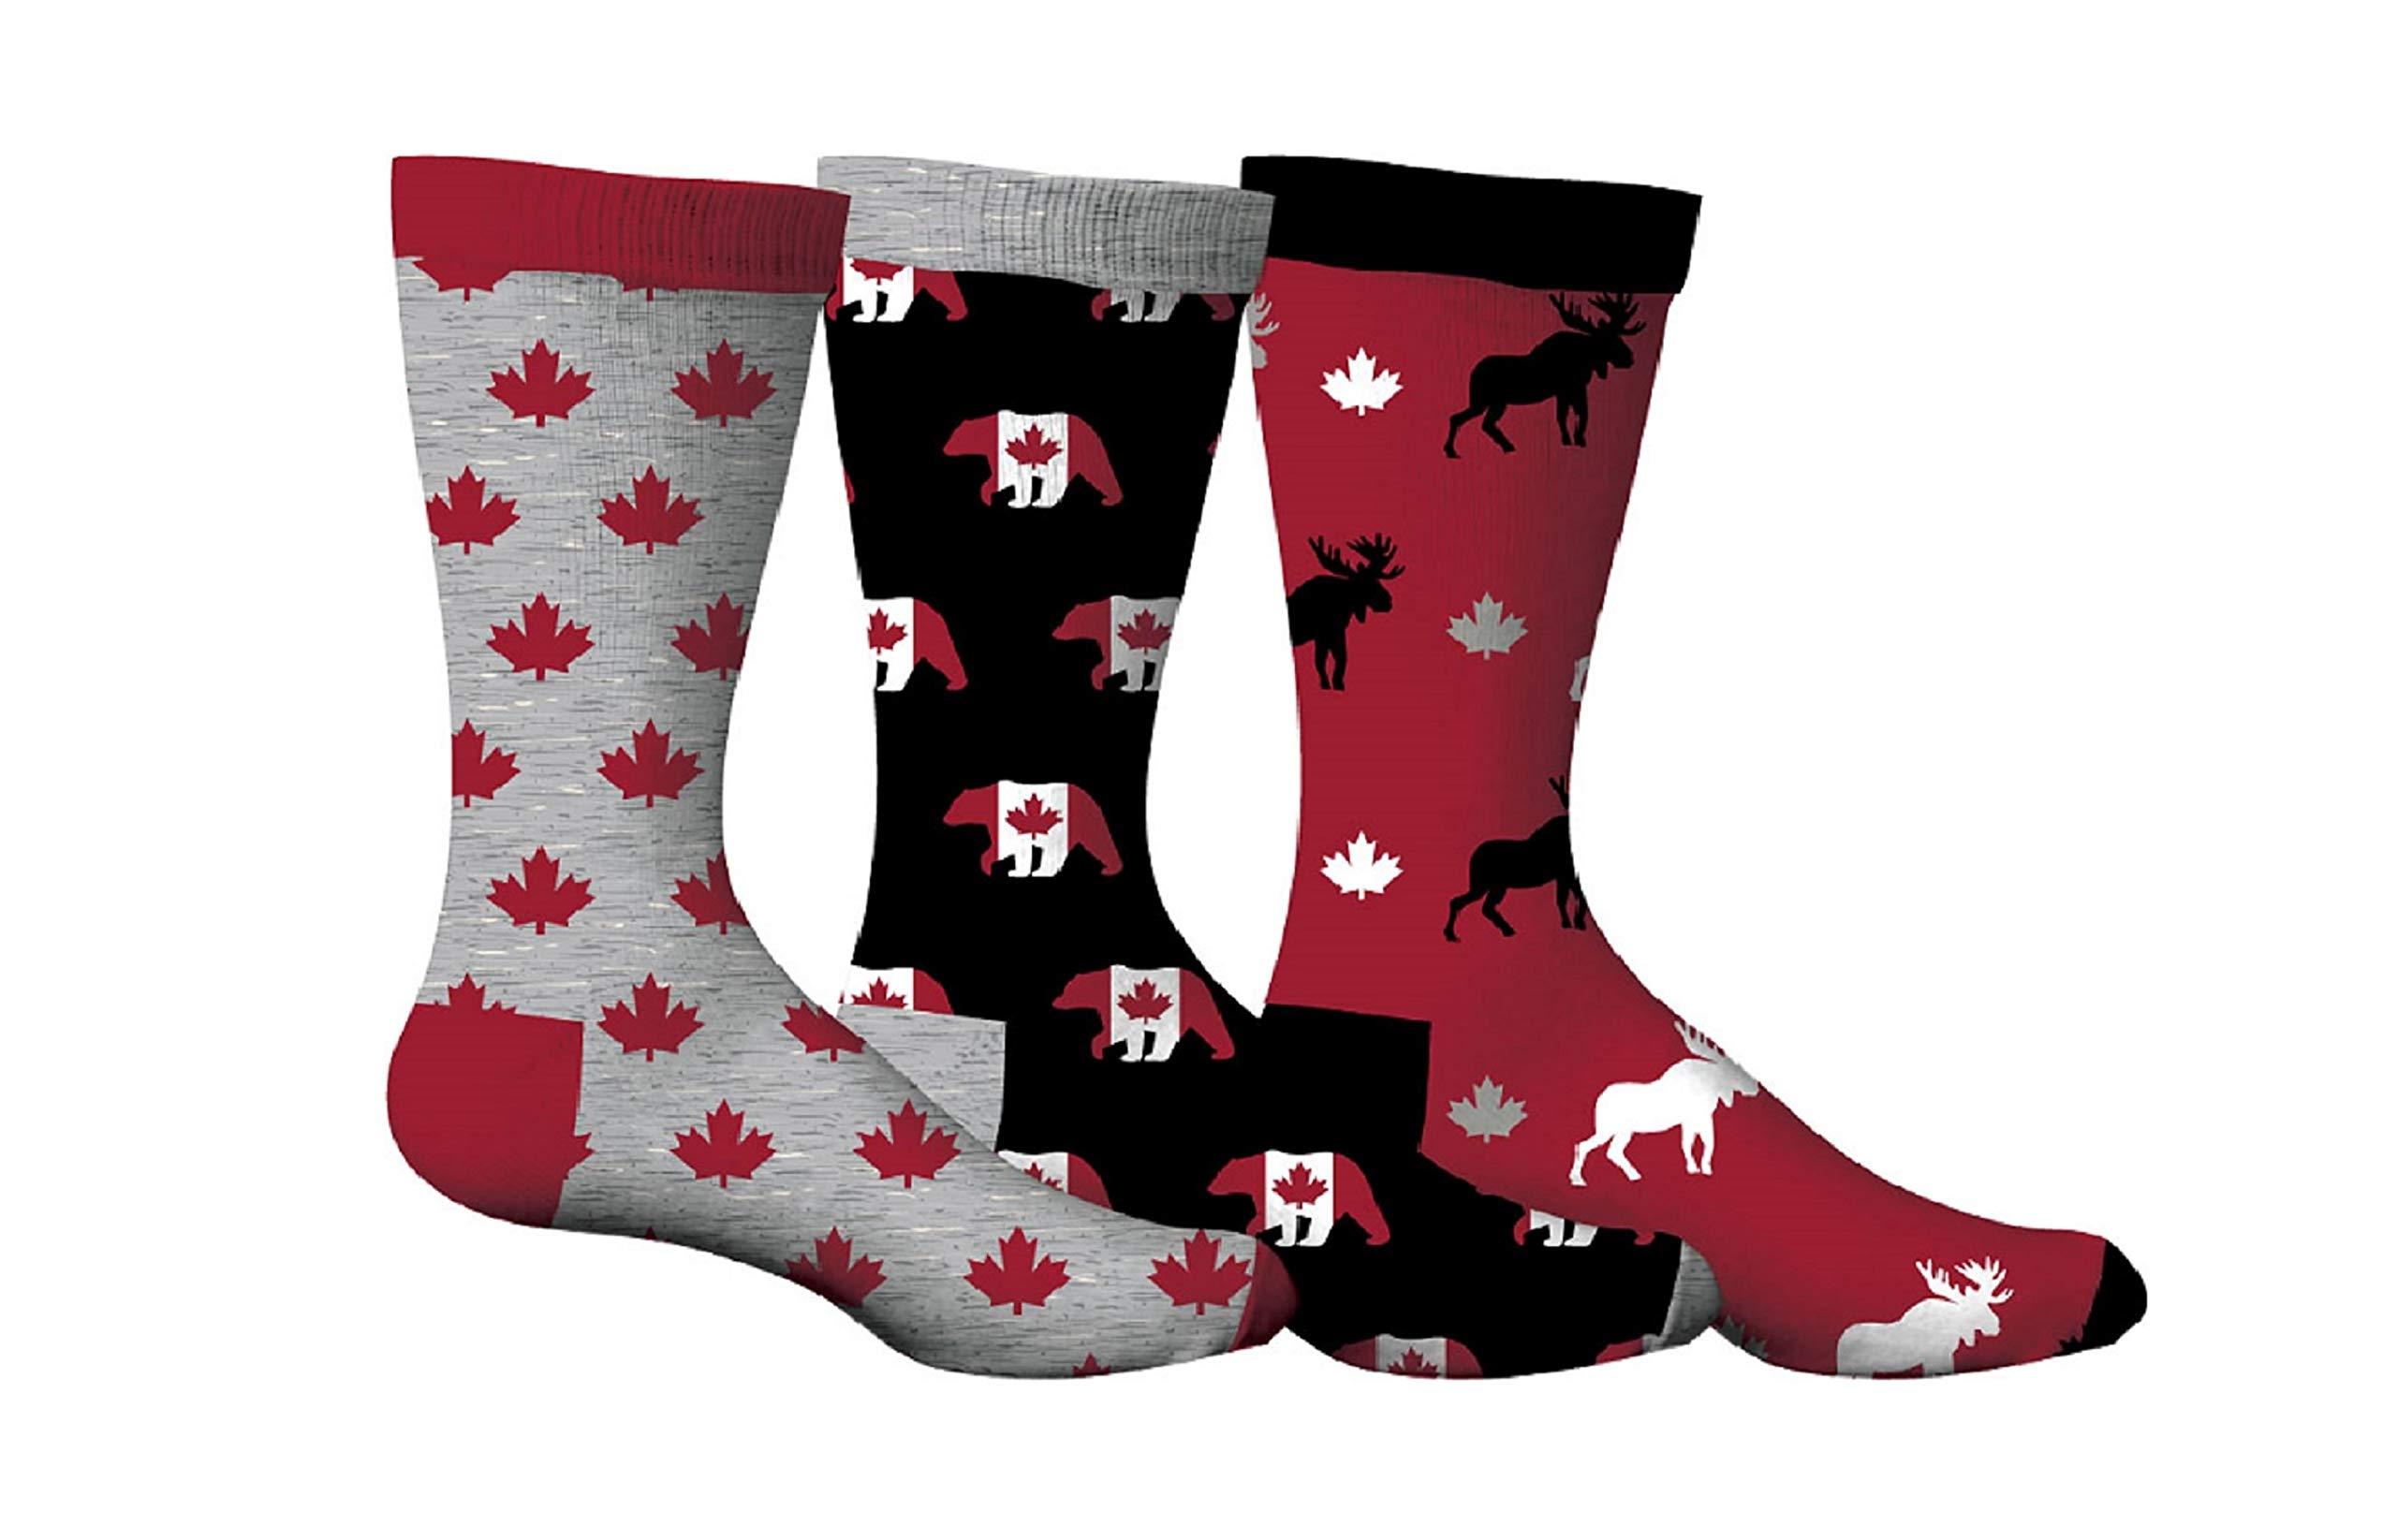 3cbb2acc98ad Densley   Co Men s Fun Dress Socks 3-Pack (Various Designs) product image